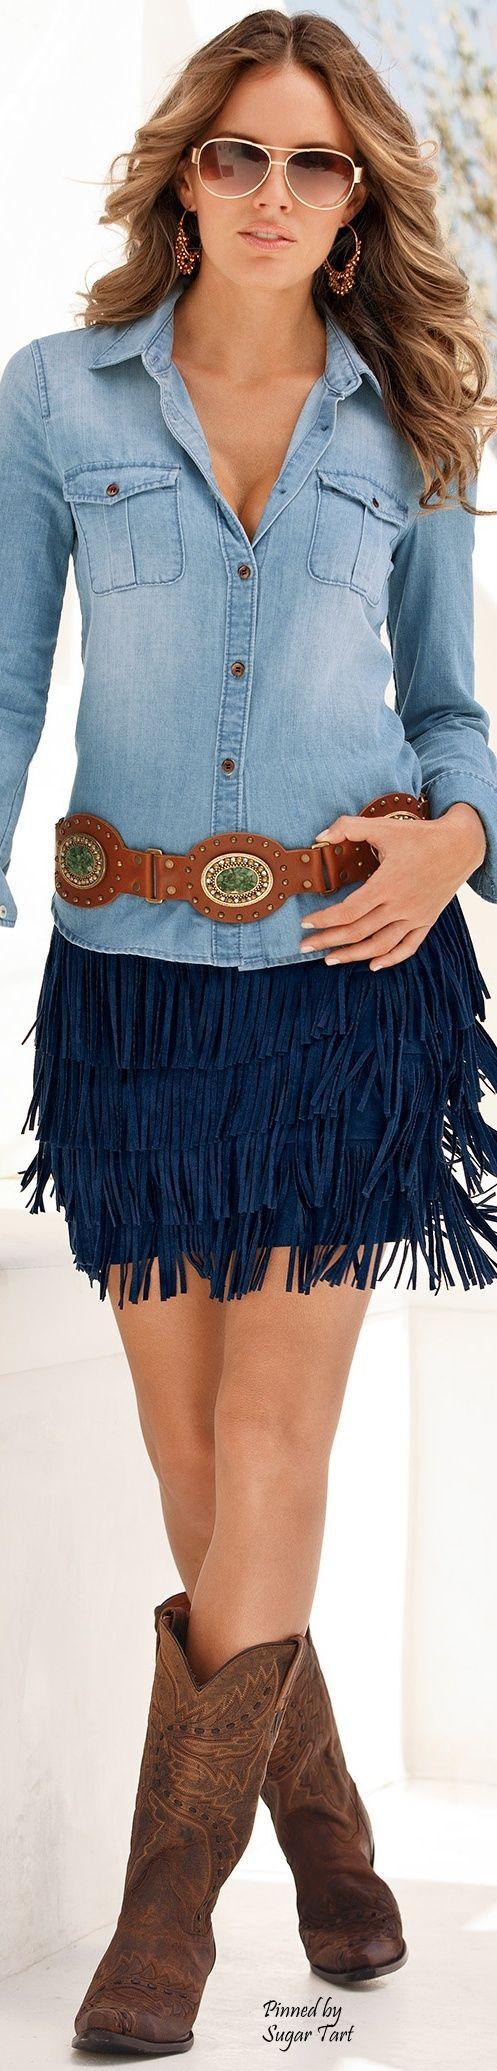 Fringe Skirt & Jean Shirt/Cowboy Boots